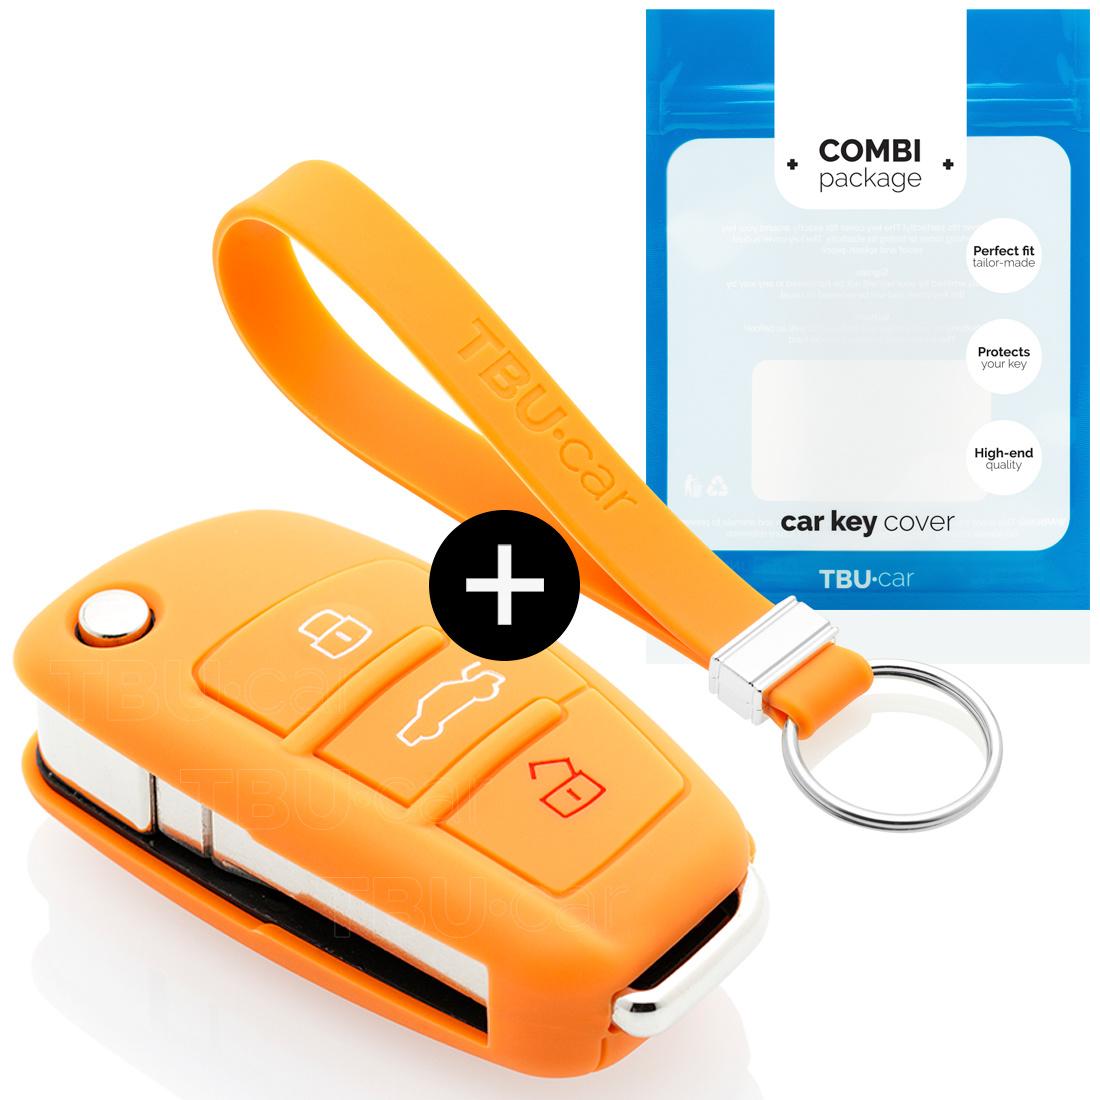 TBU car Audi Sleutel Cover - Silicone sleutelhoesje - beschermhoesje autosleutel - Oranje